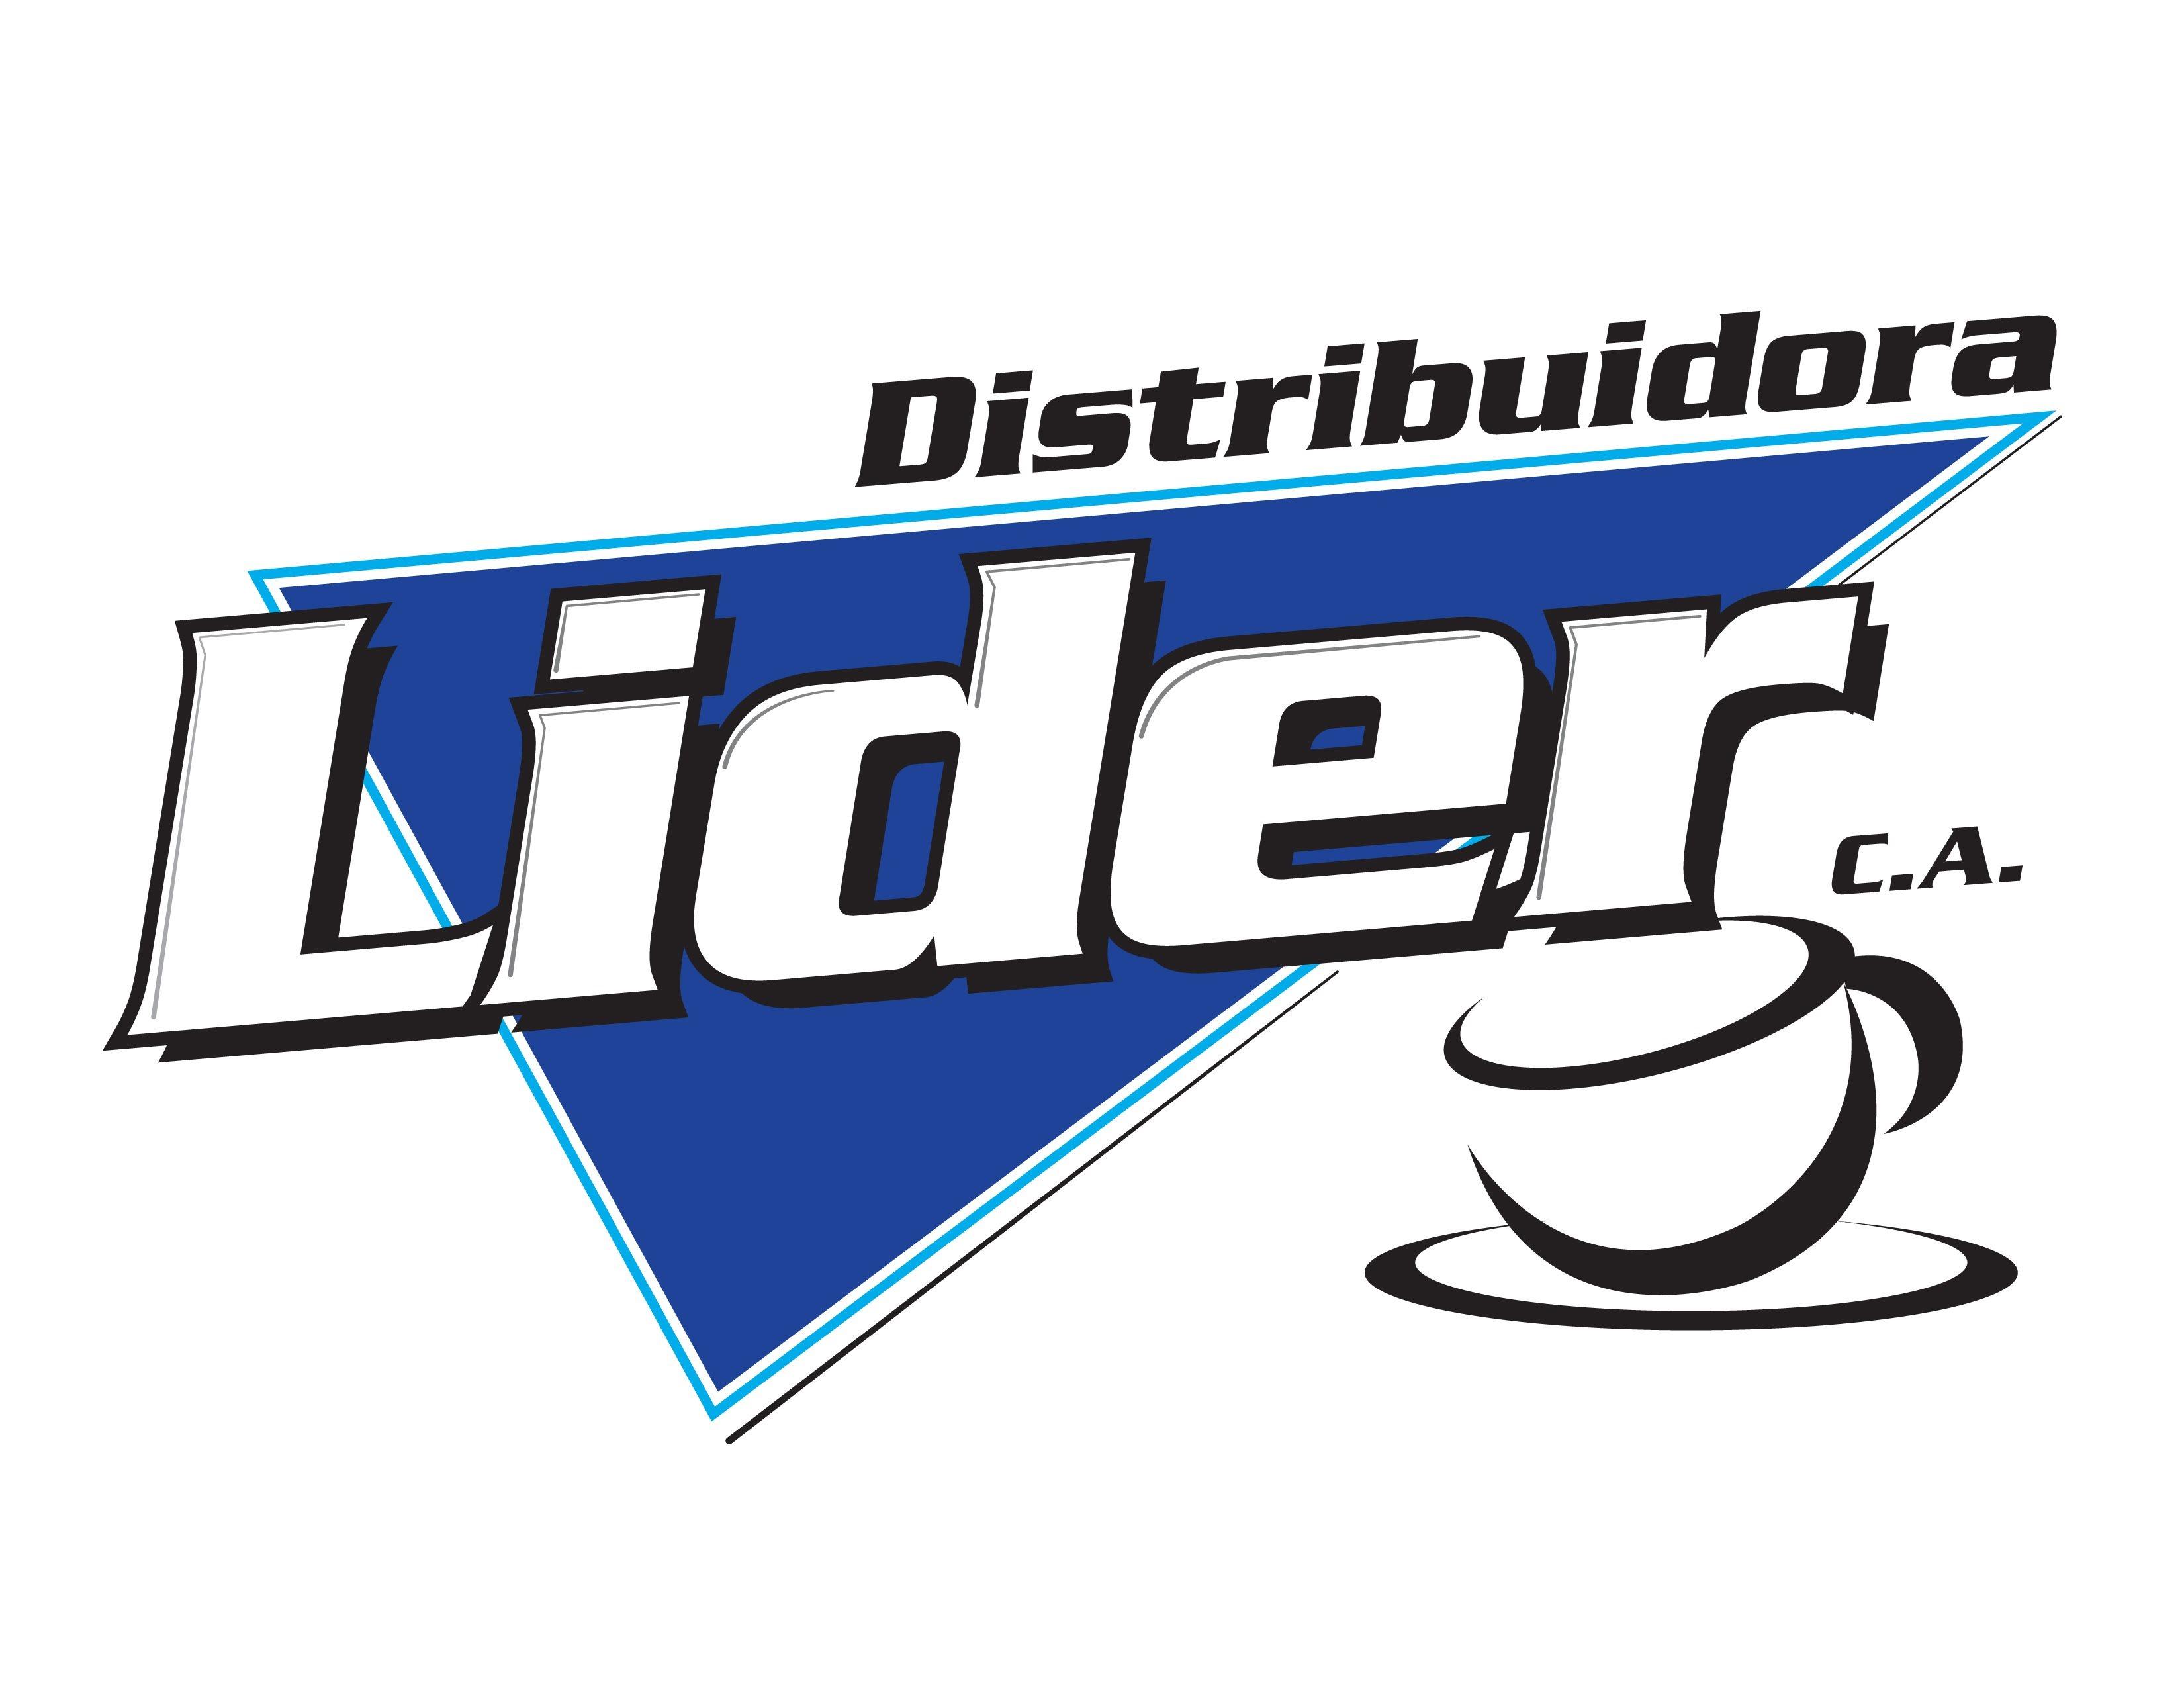 Distribuidora Lider, c.a.